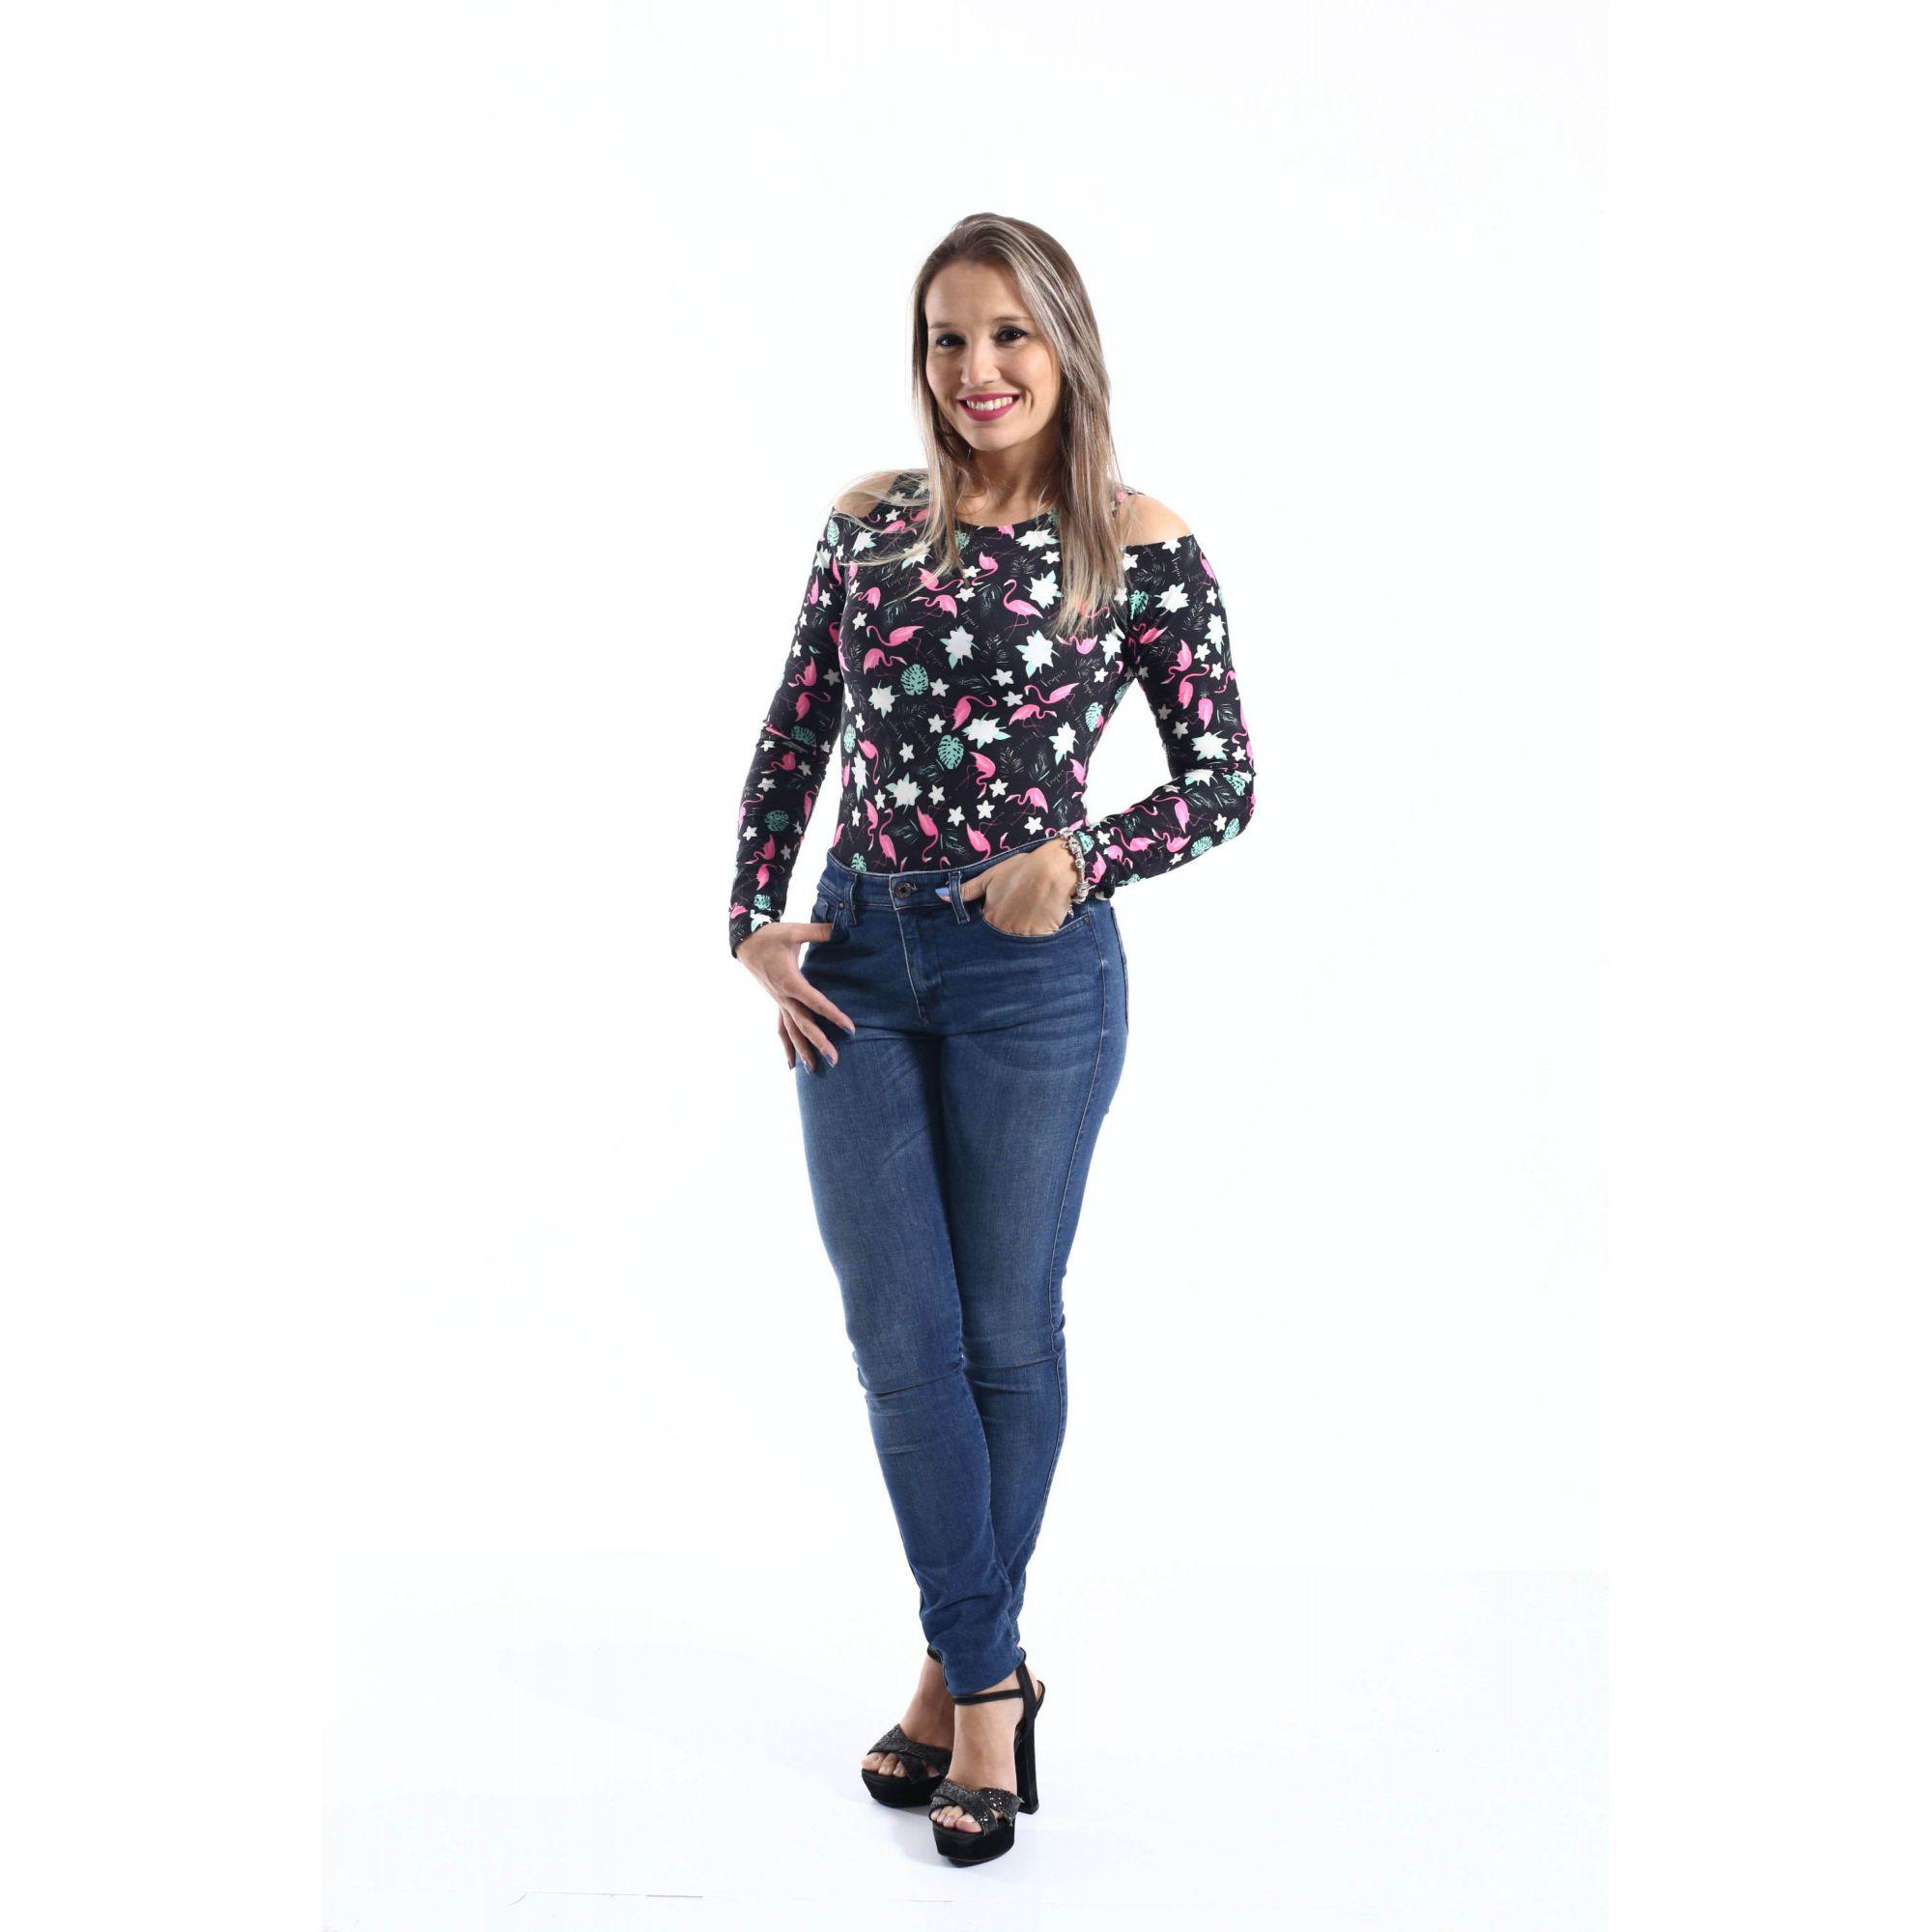 Mãe e Filha > Kit 02 Bodys Femininos manga Longa Flamingo  [Coleção Tal Mãe Tal Filha]  - Heitor Fashion Brazil